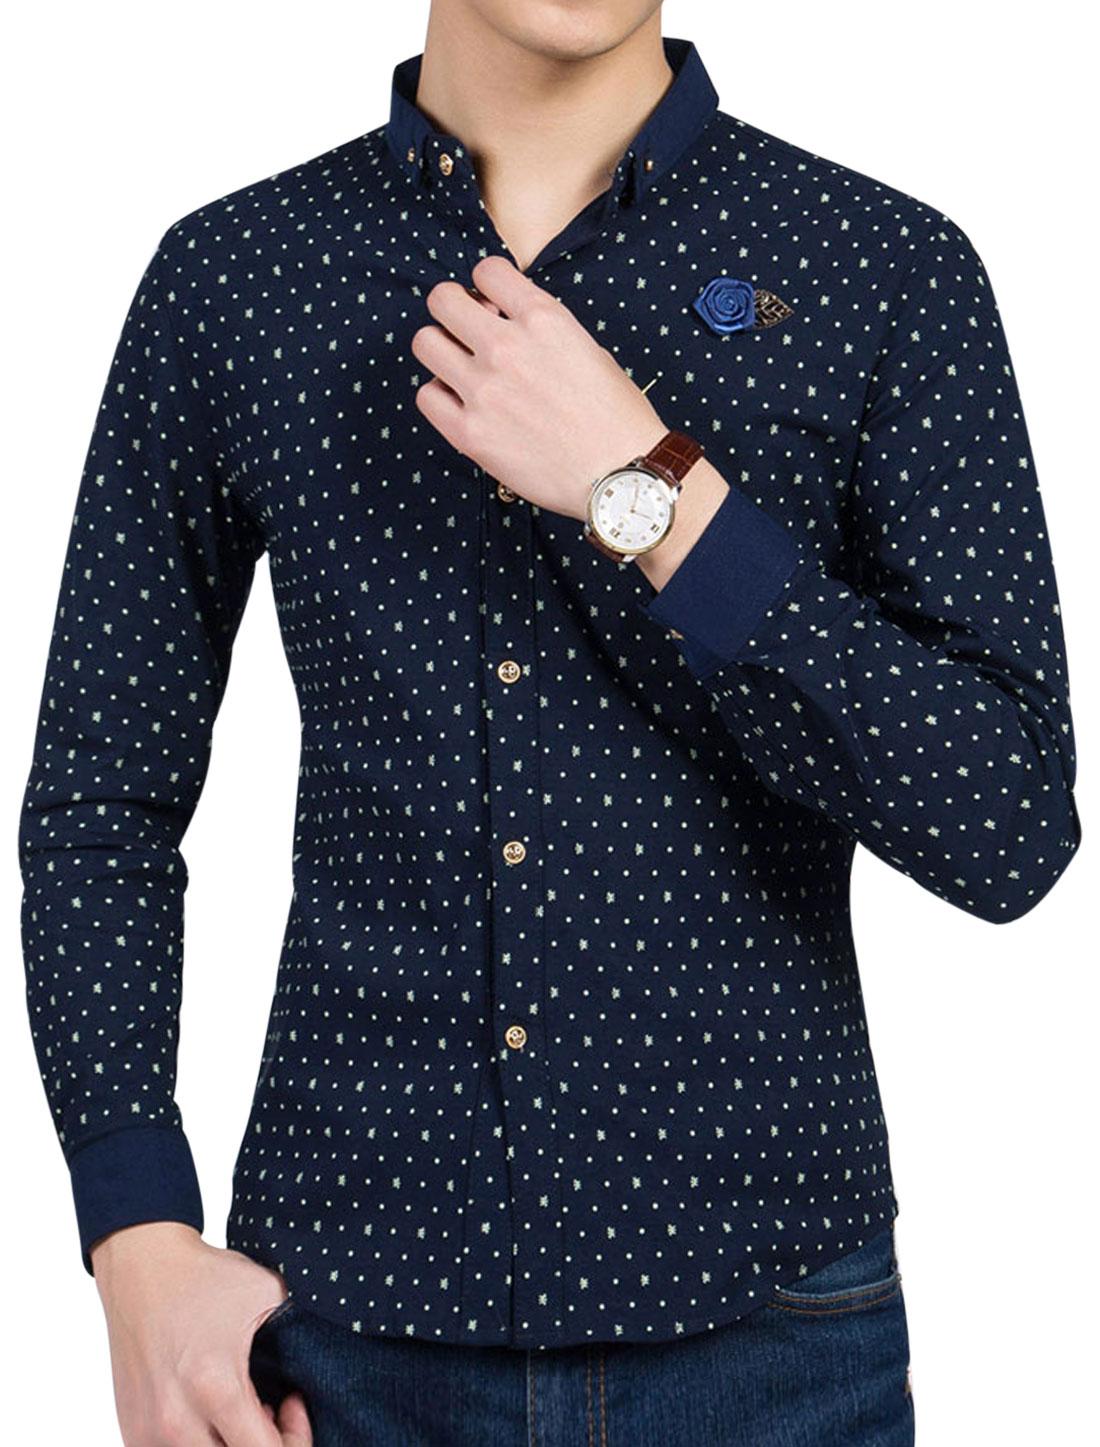 Man Novelty Dots Prints Turn Down Collar Casual Shirt w Brooch Navy Blue M